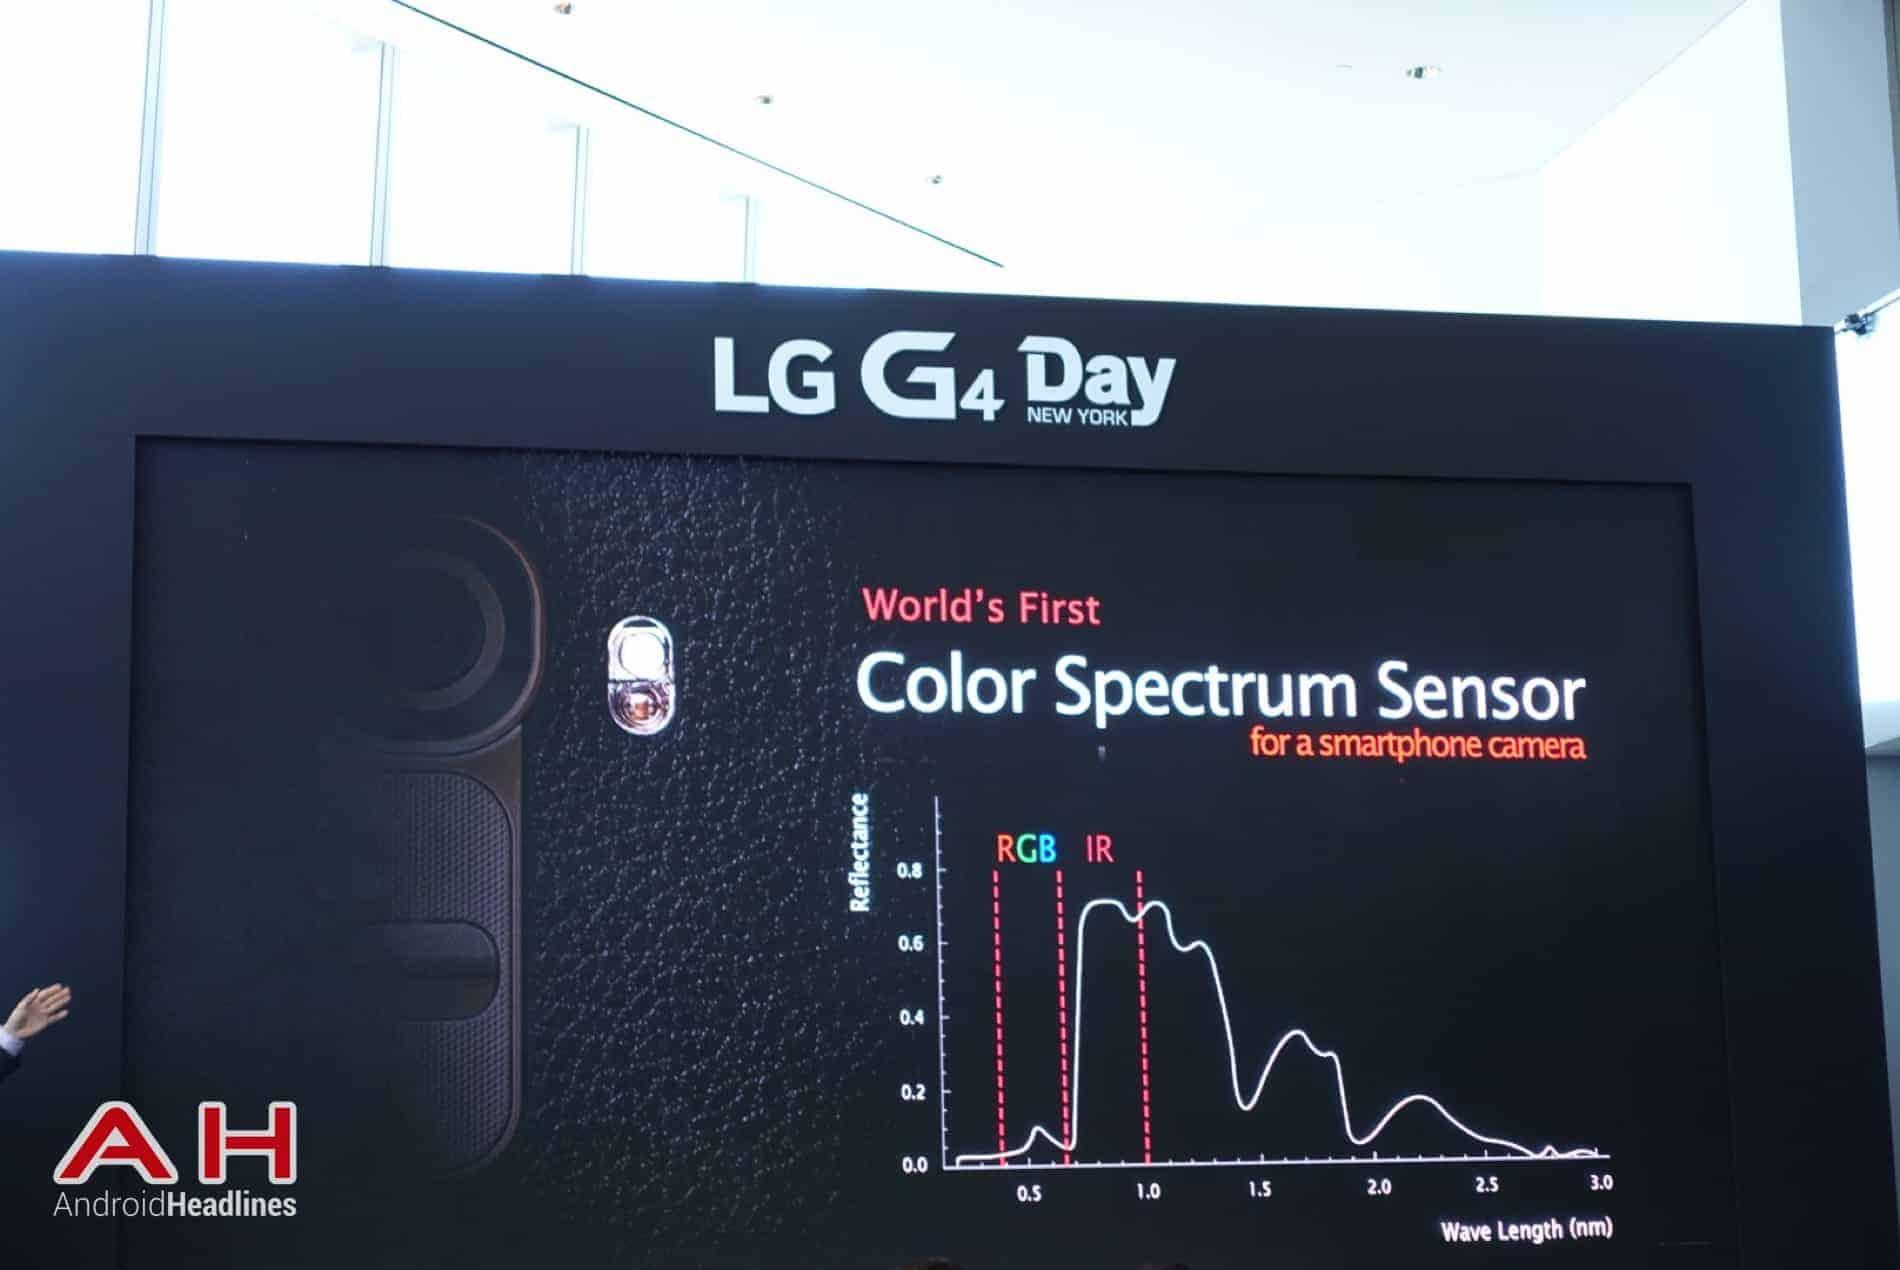 LG G4 Day AH 03 131